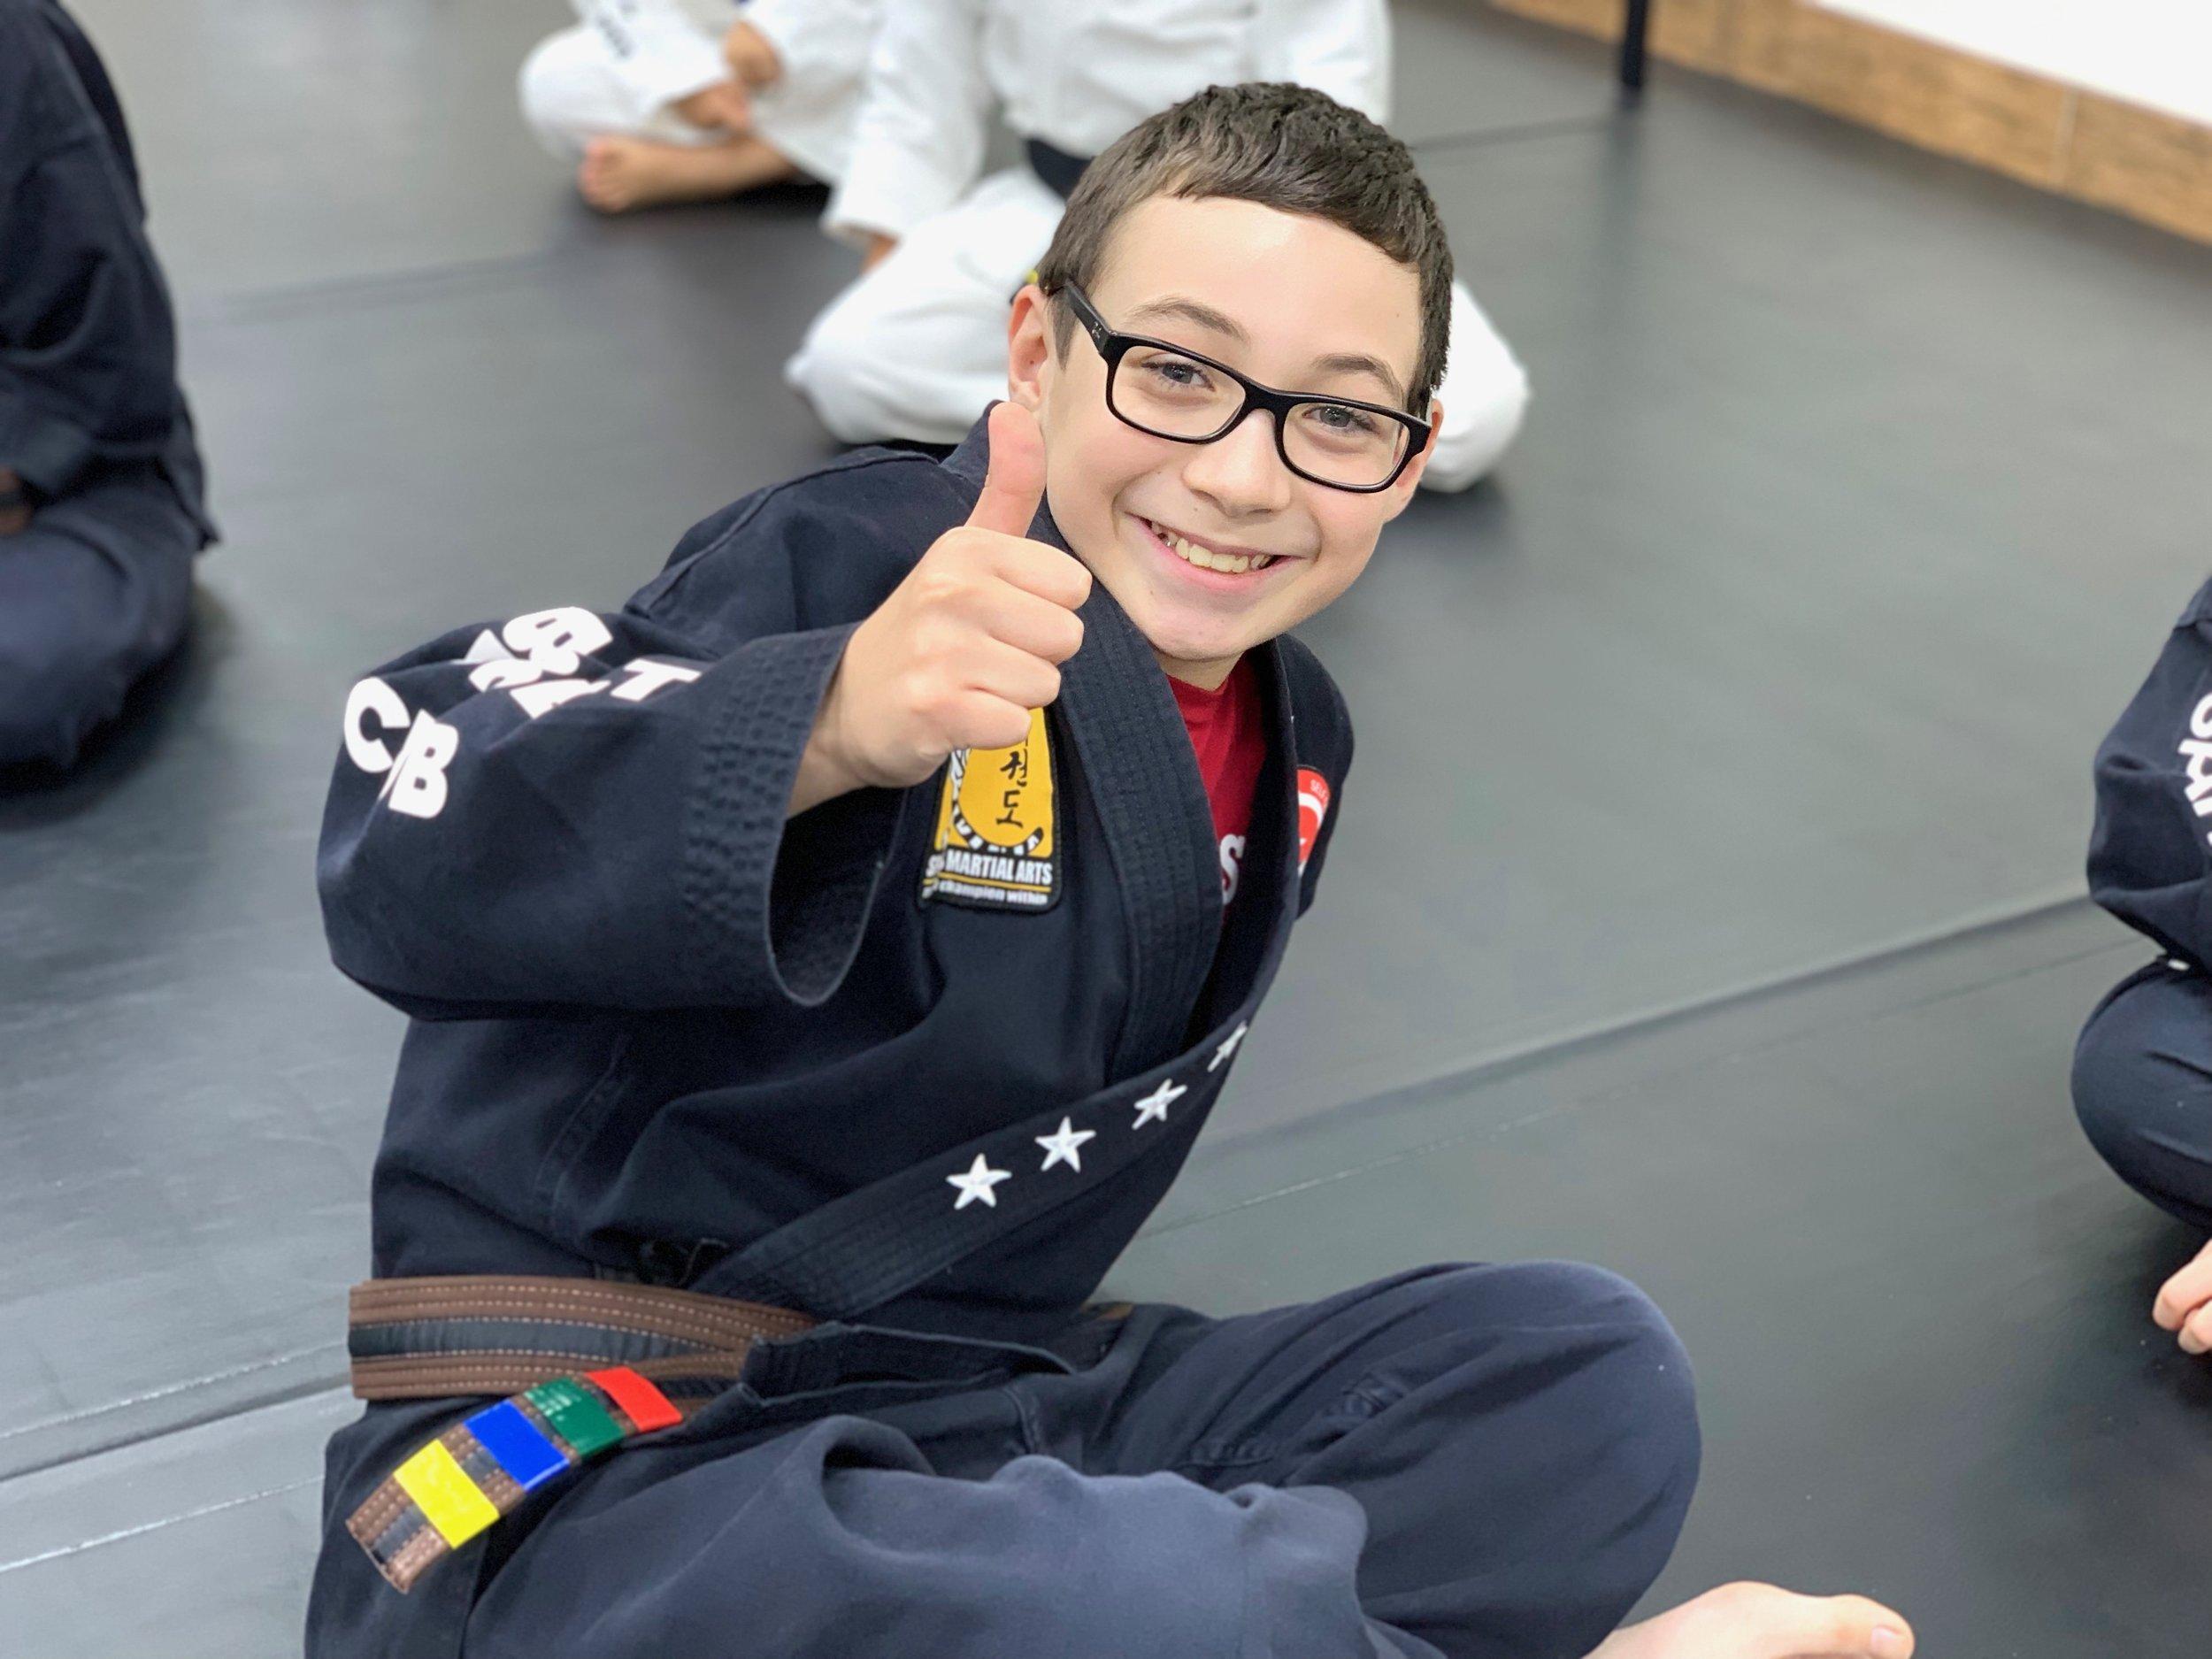 karate-kids-program-souhtlake-keller-grapevine-texas00041.jpeg